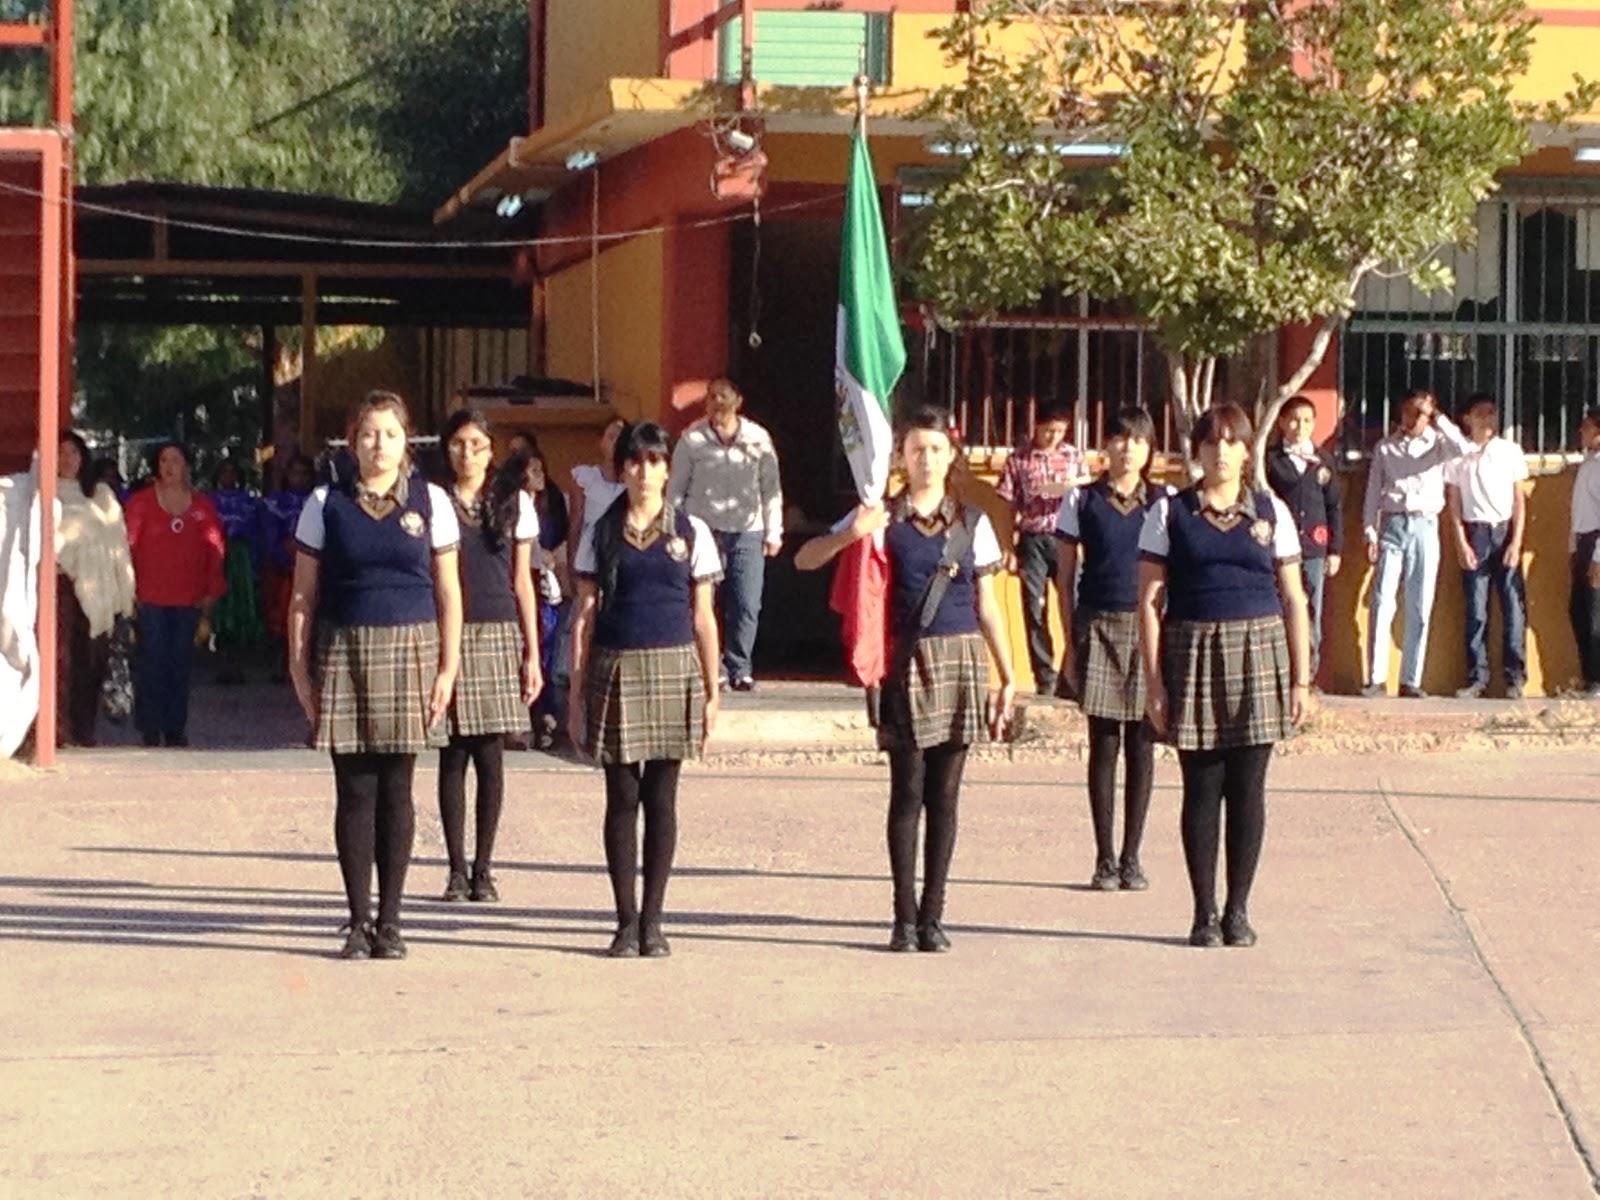 Fotos De Uniformes Escolares Para Escolta | newhairstylesformen2014